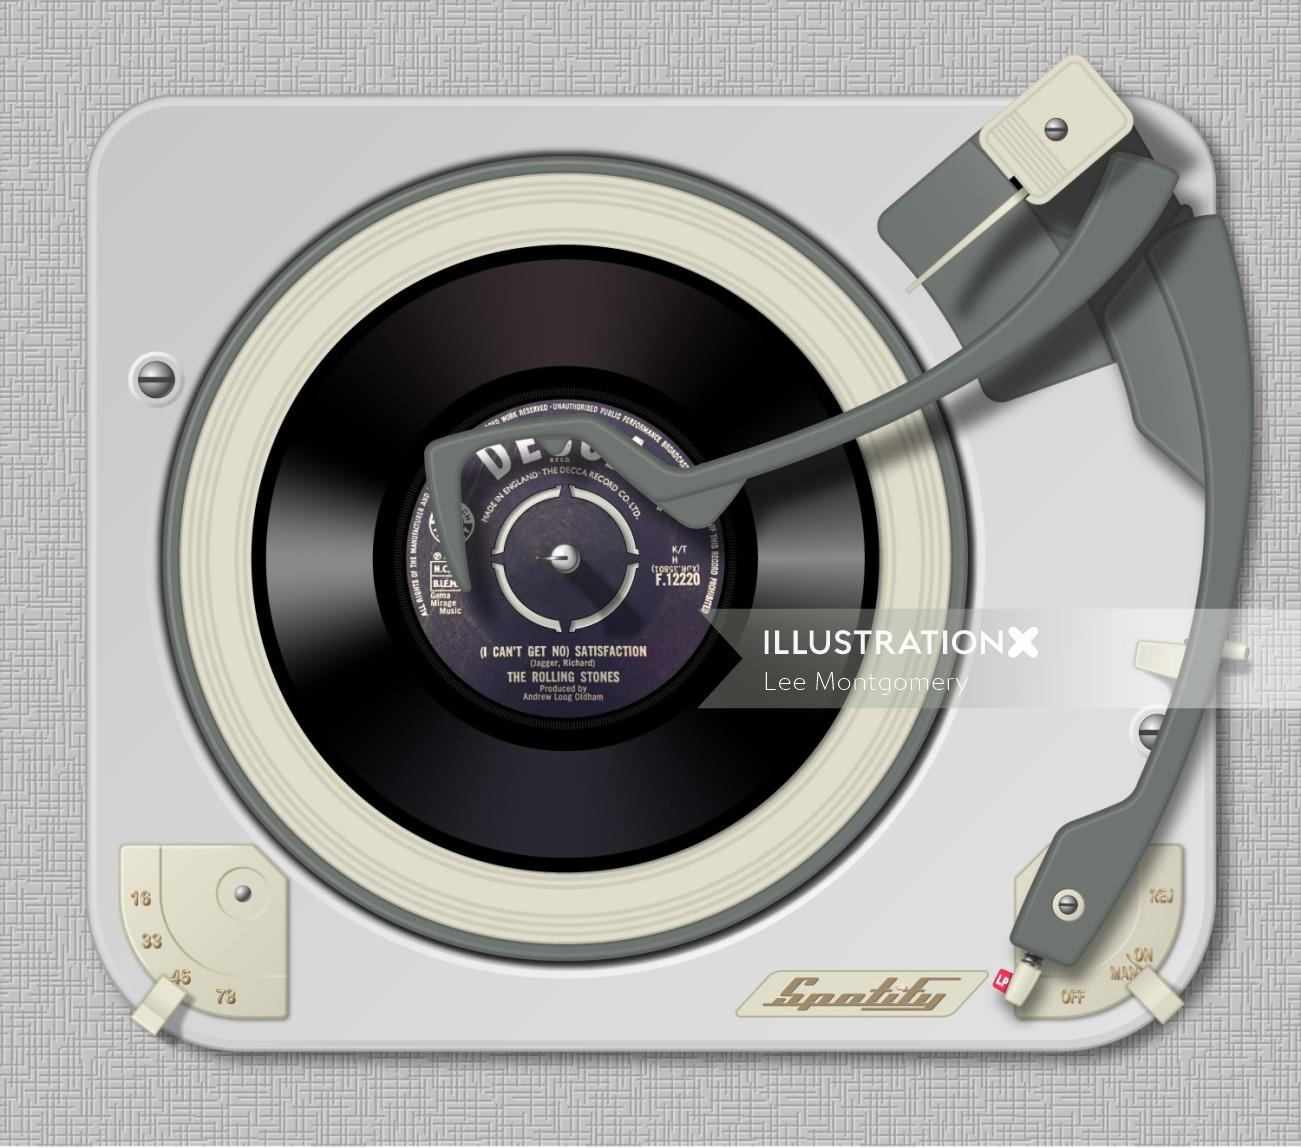 Vintage Turntable vinyl record